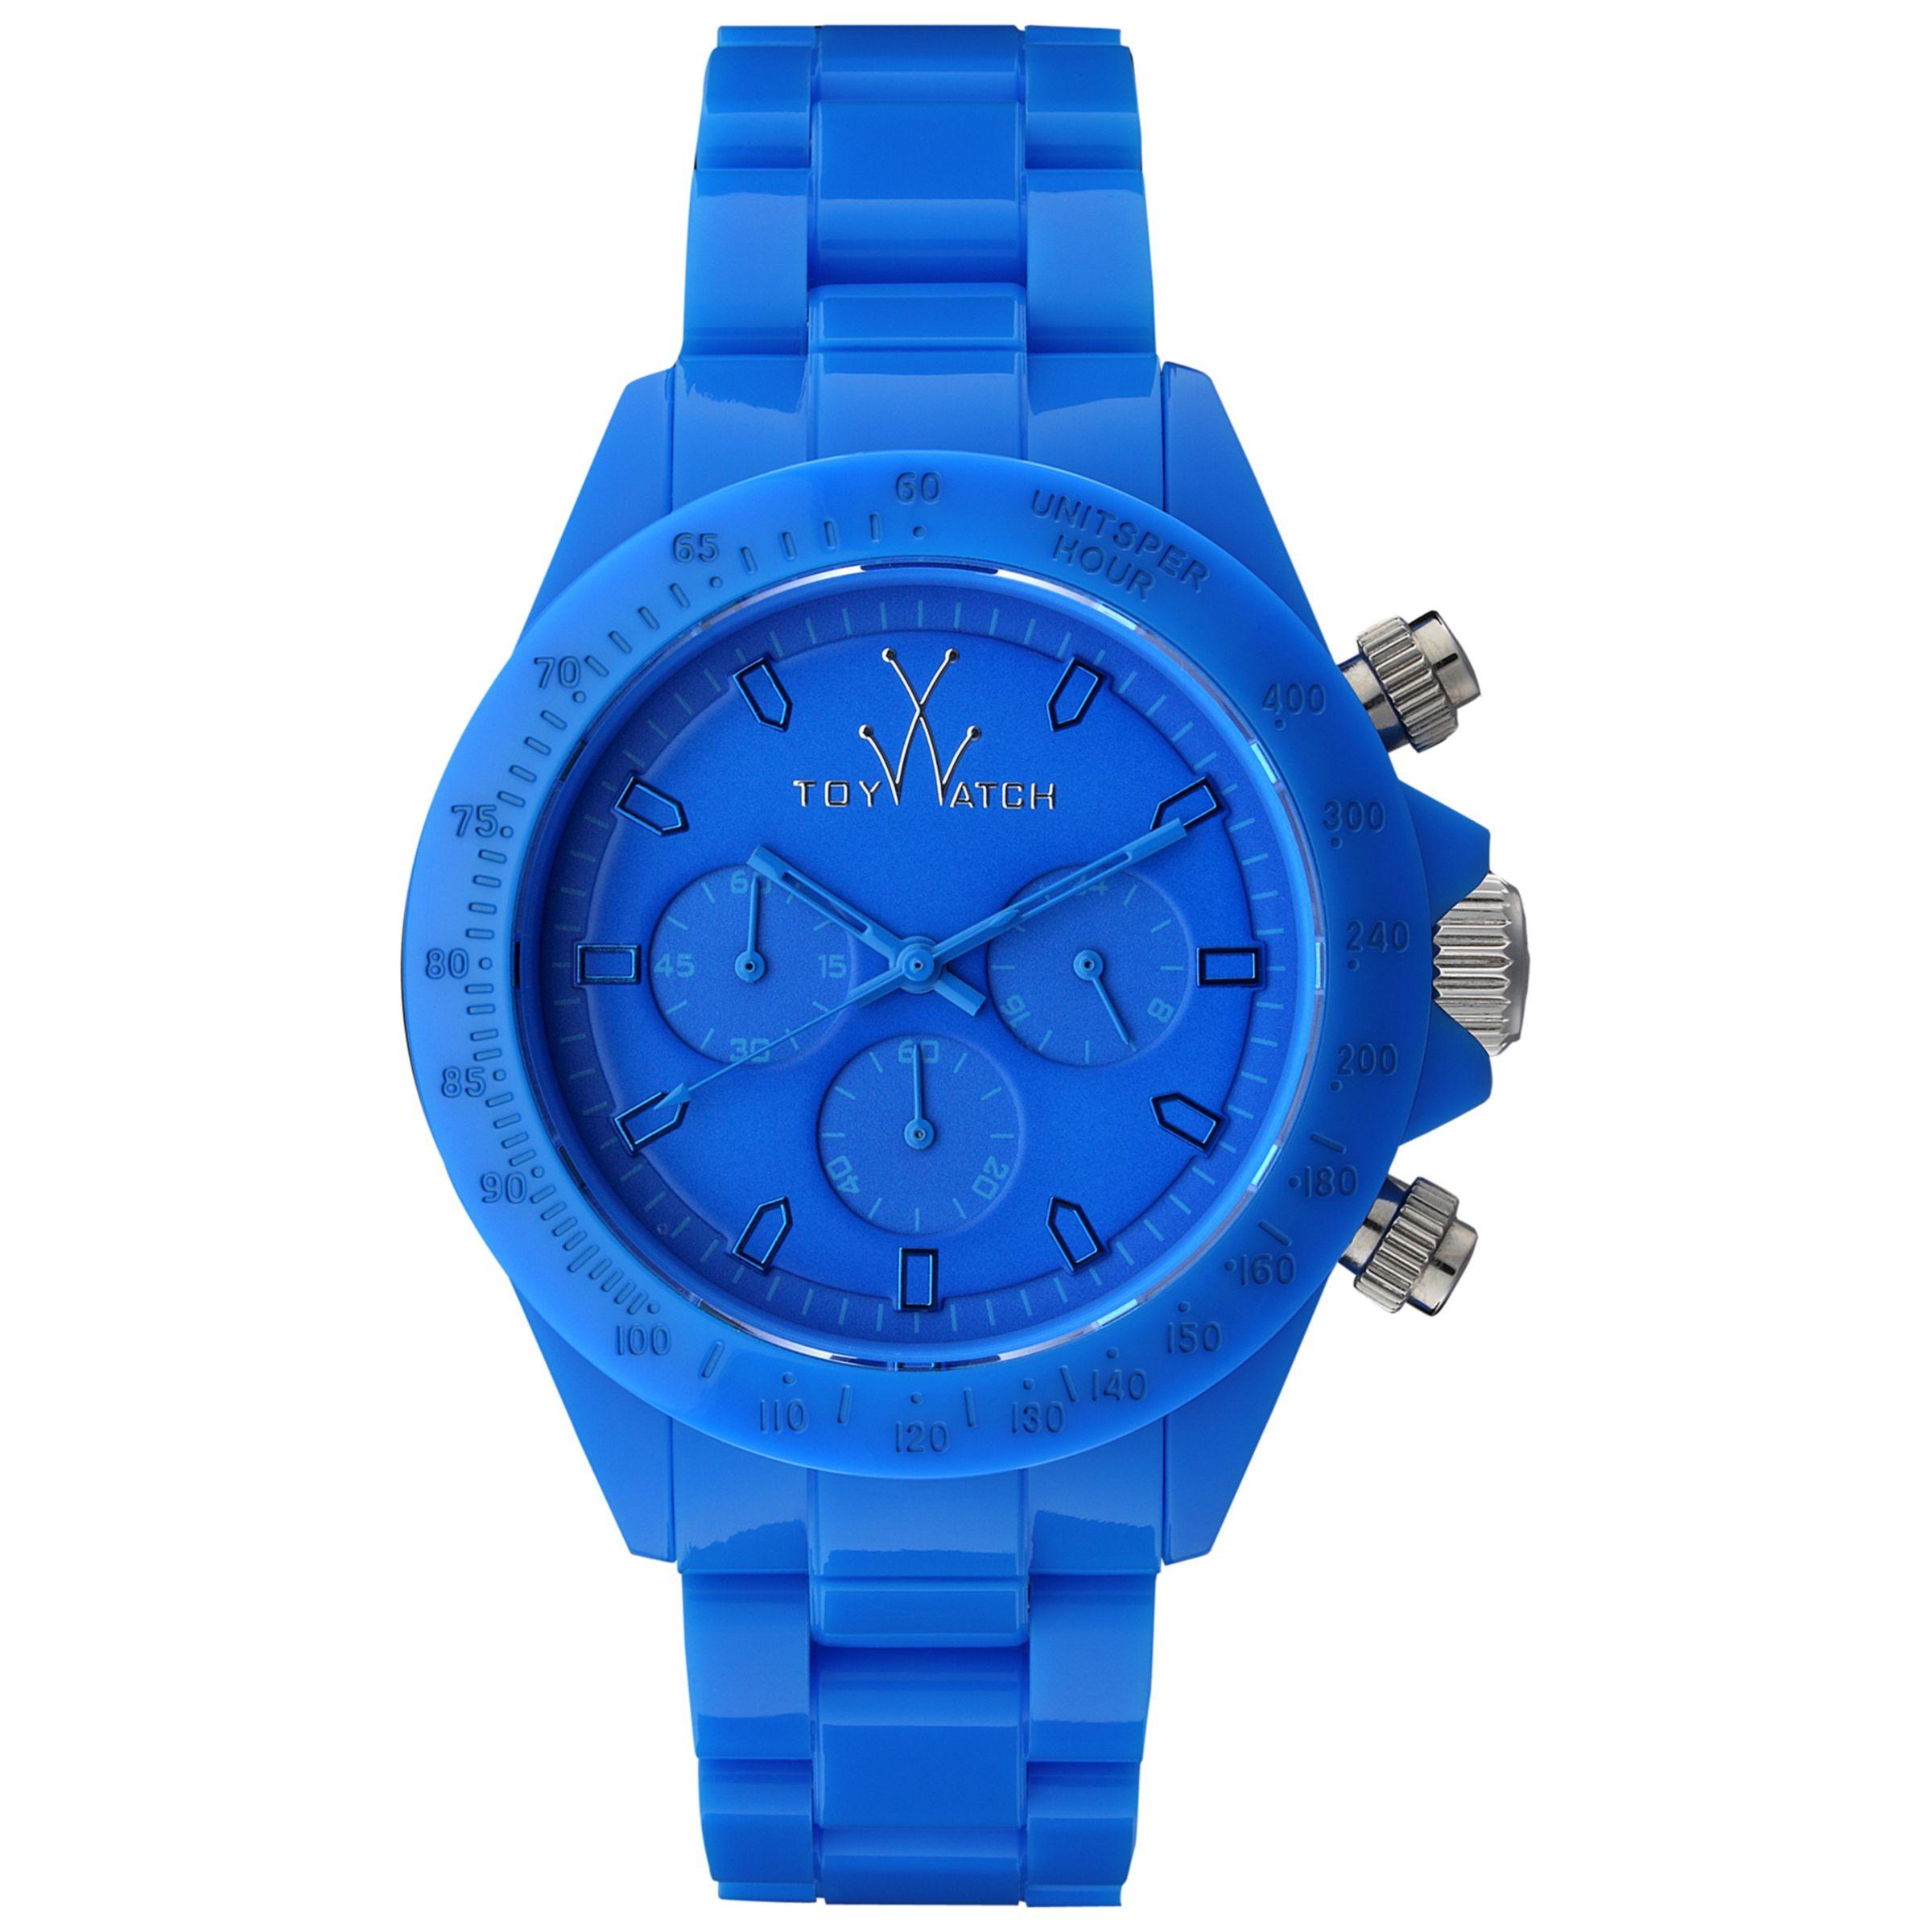 Toy Watch MO09LB Unisex Blue Monochrome Chronograph Bracelet Watch, Blue